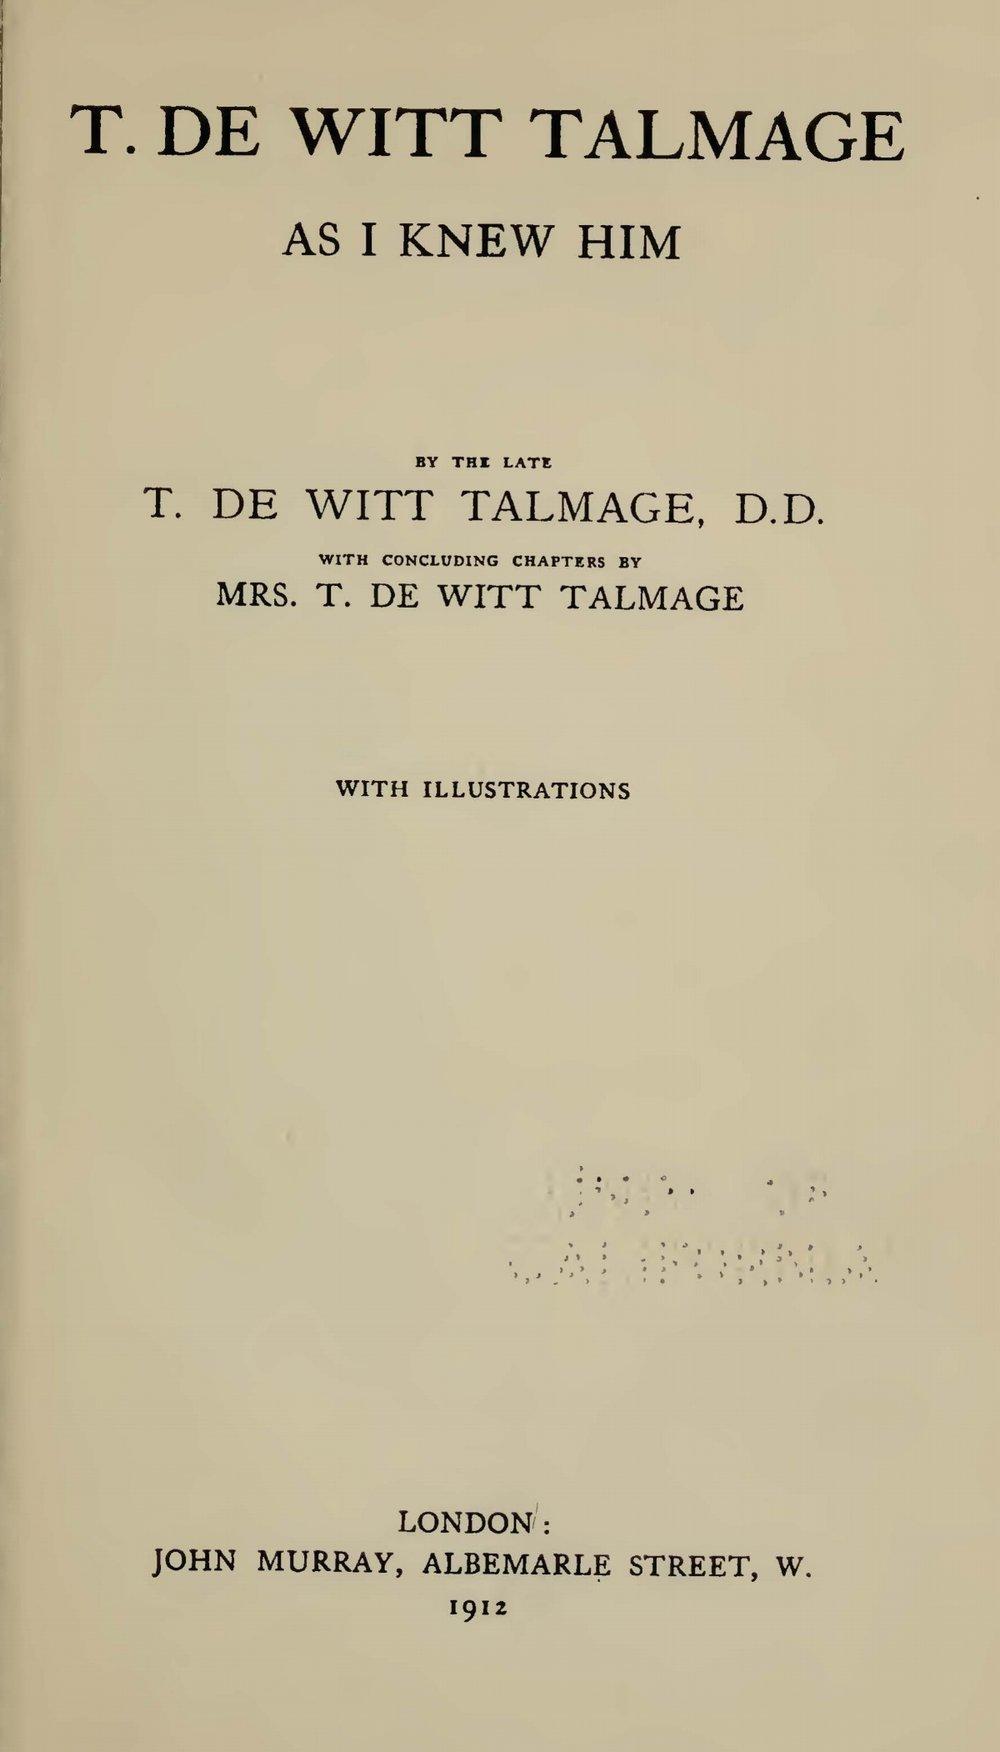 Talmage, Thomas De Witt, T. De Witt Talmage as I Knew Him Title Page.jpg